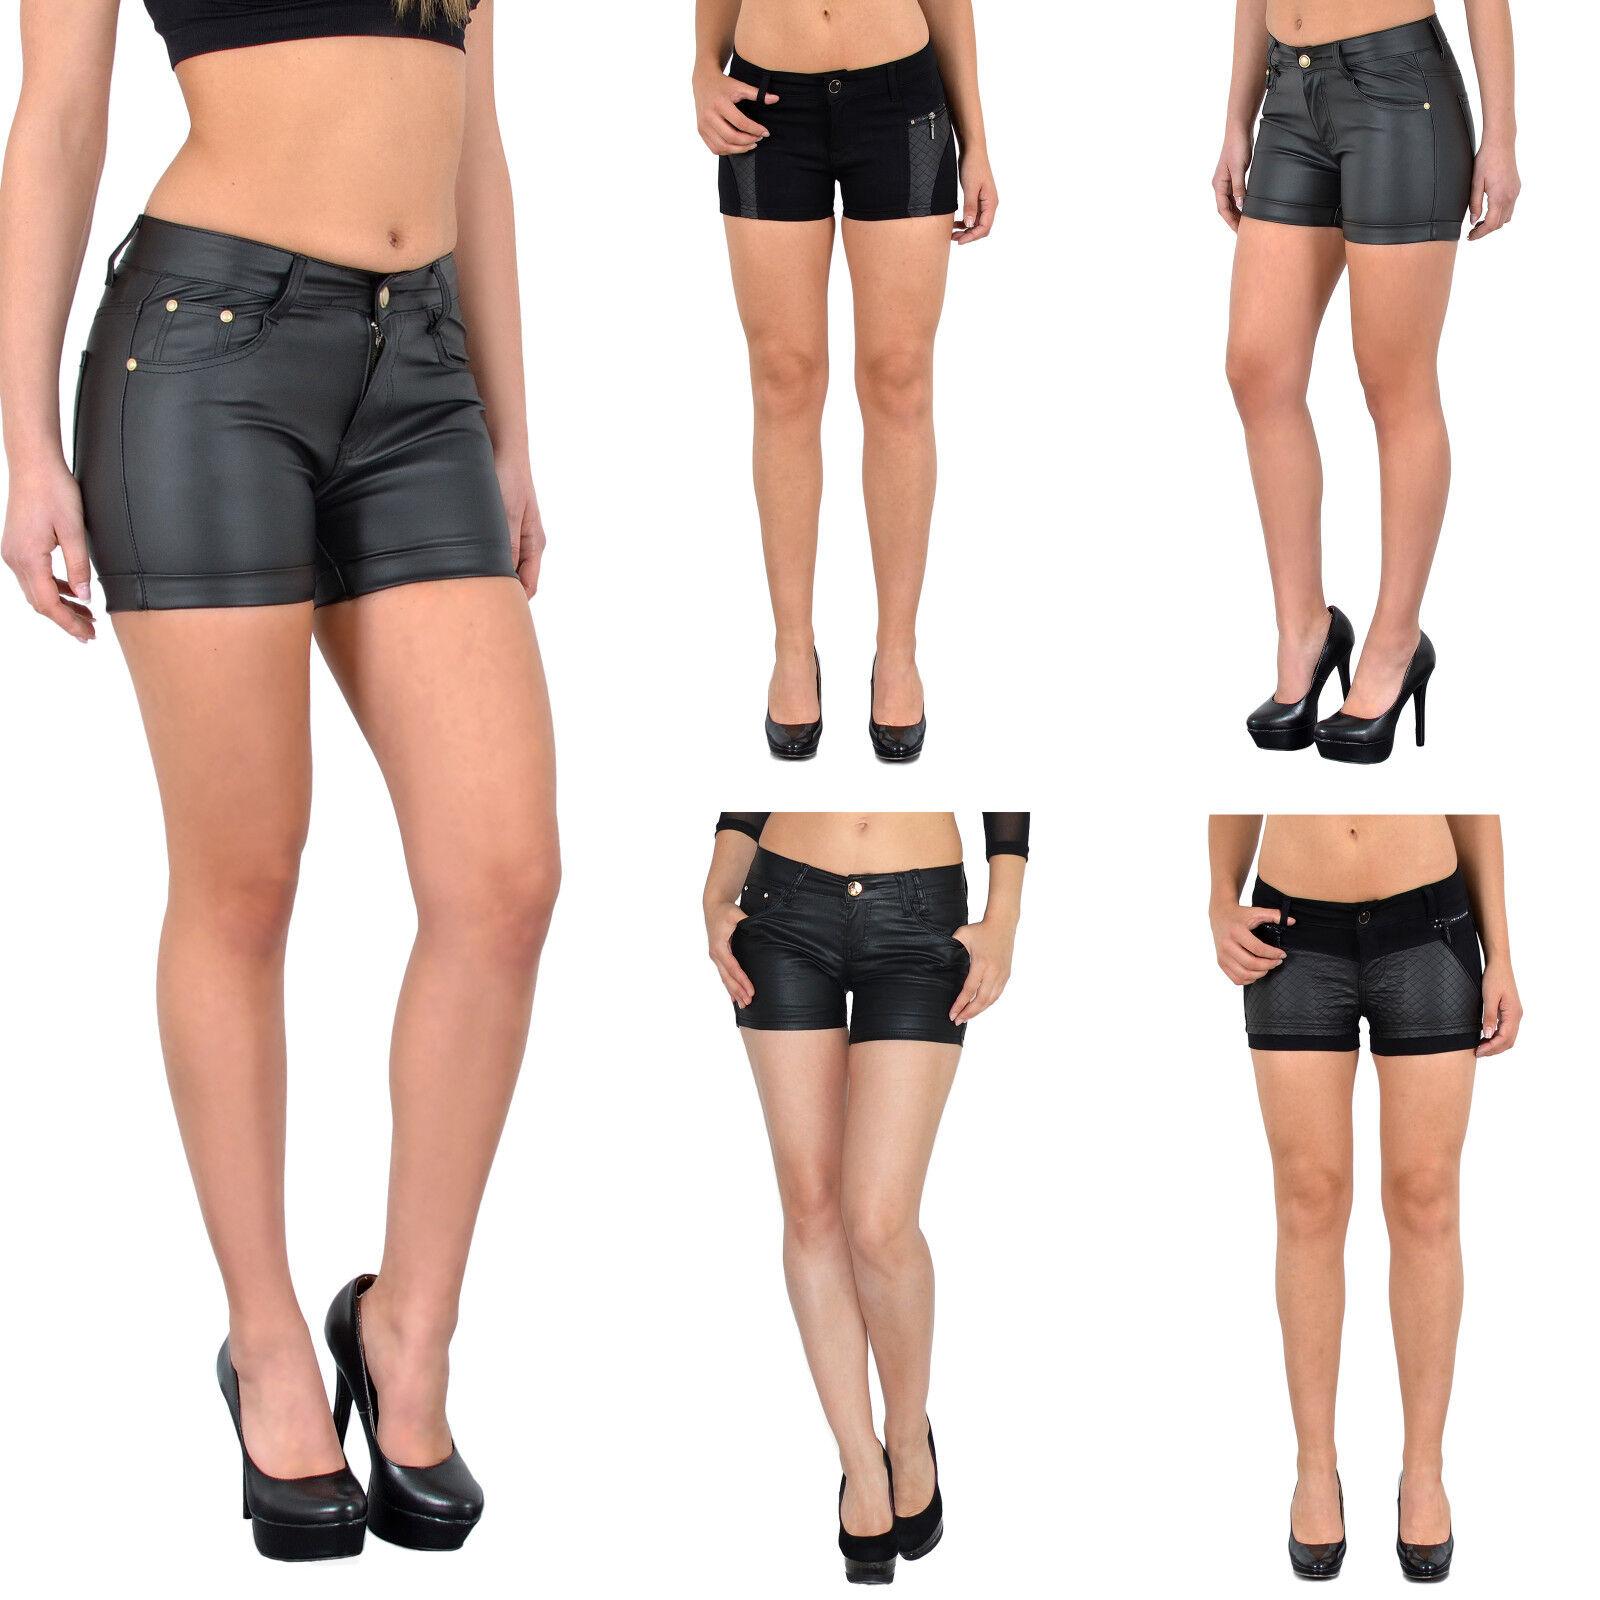 02db5e3b14080a Damen Hotpants Damenshorts Leder Optik Hot - Pants Damen Shorts kurze Hose  H35*